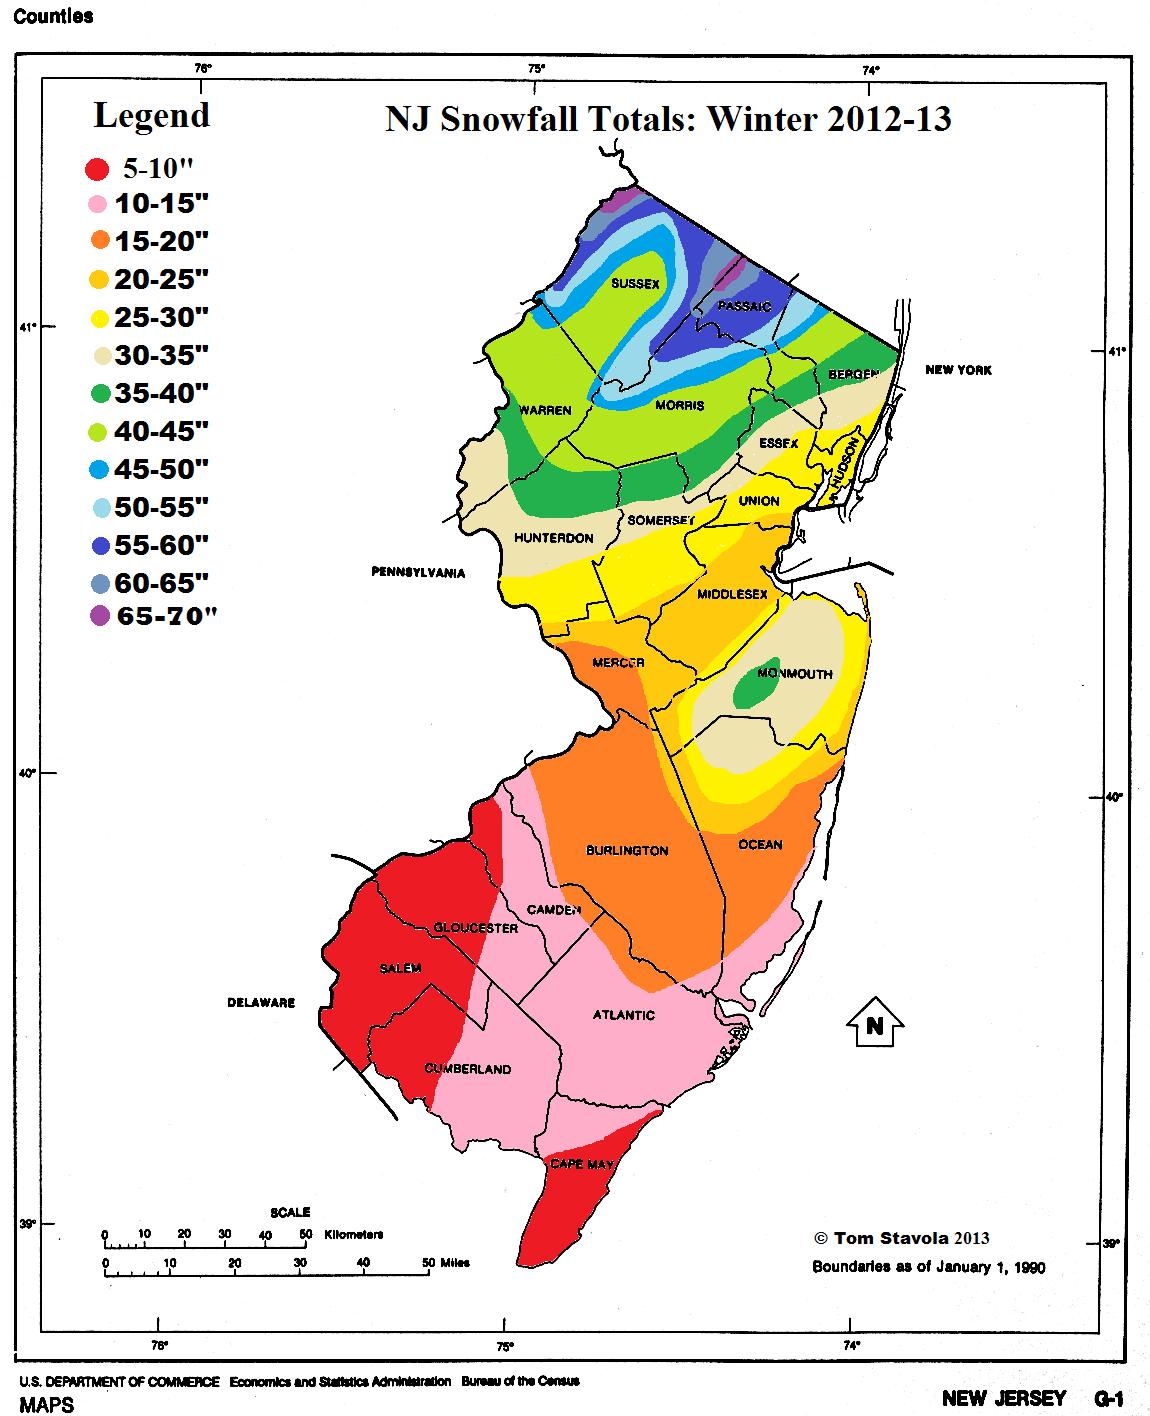 NJ Snowfall 2012 to 13